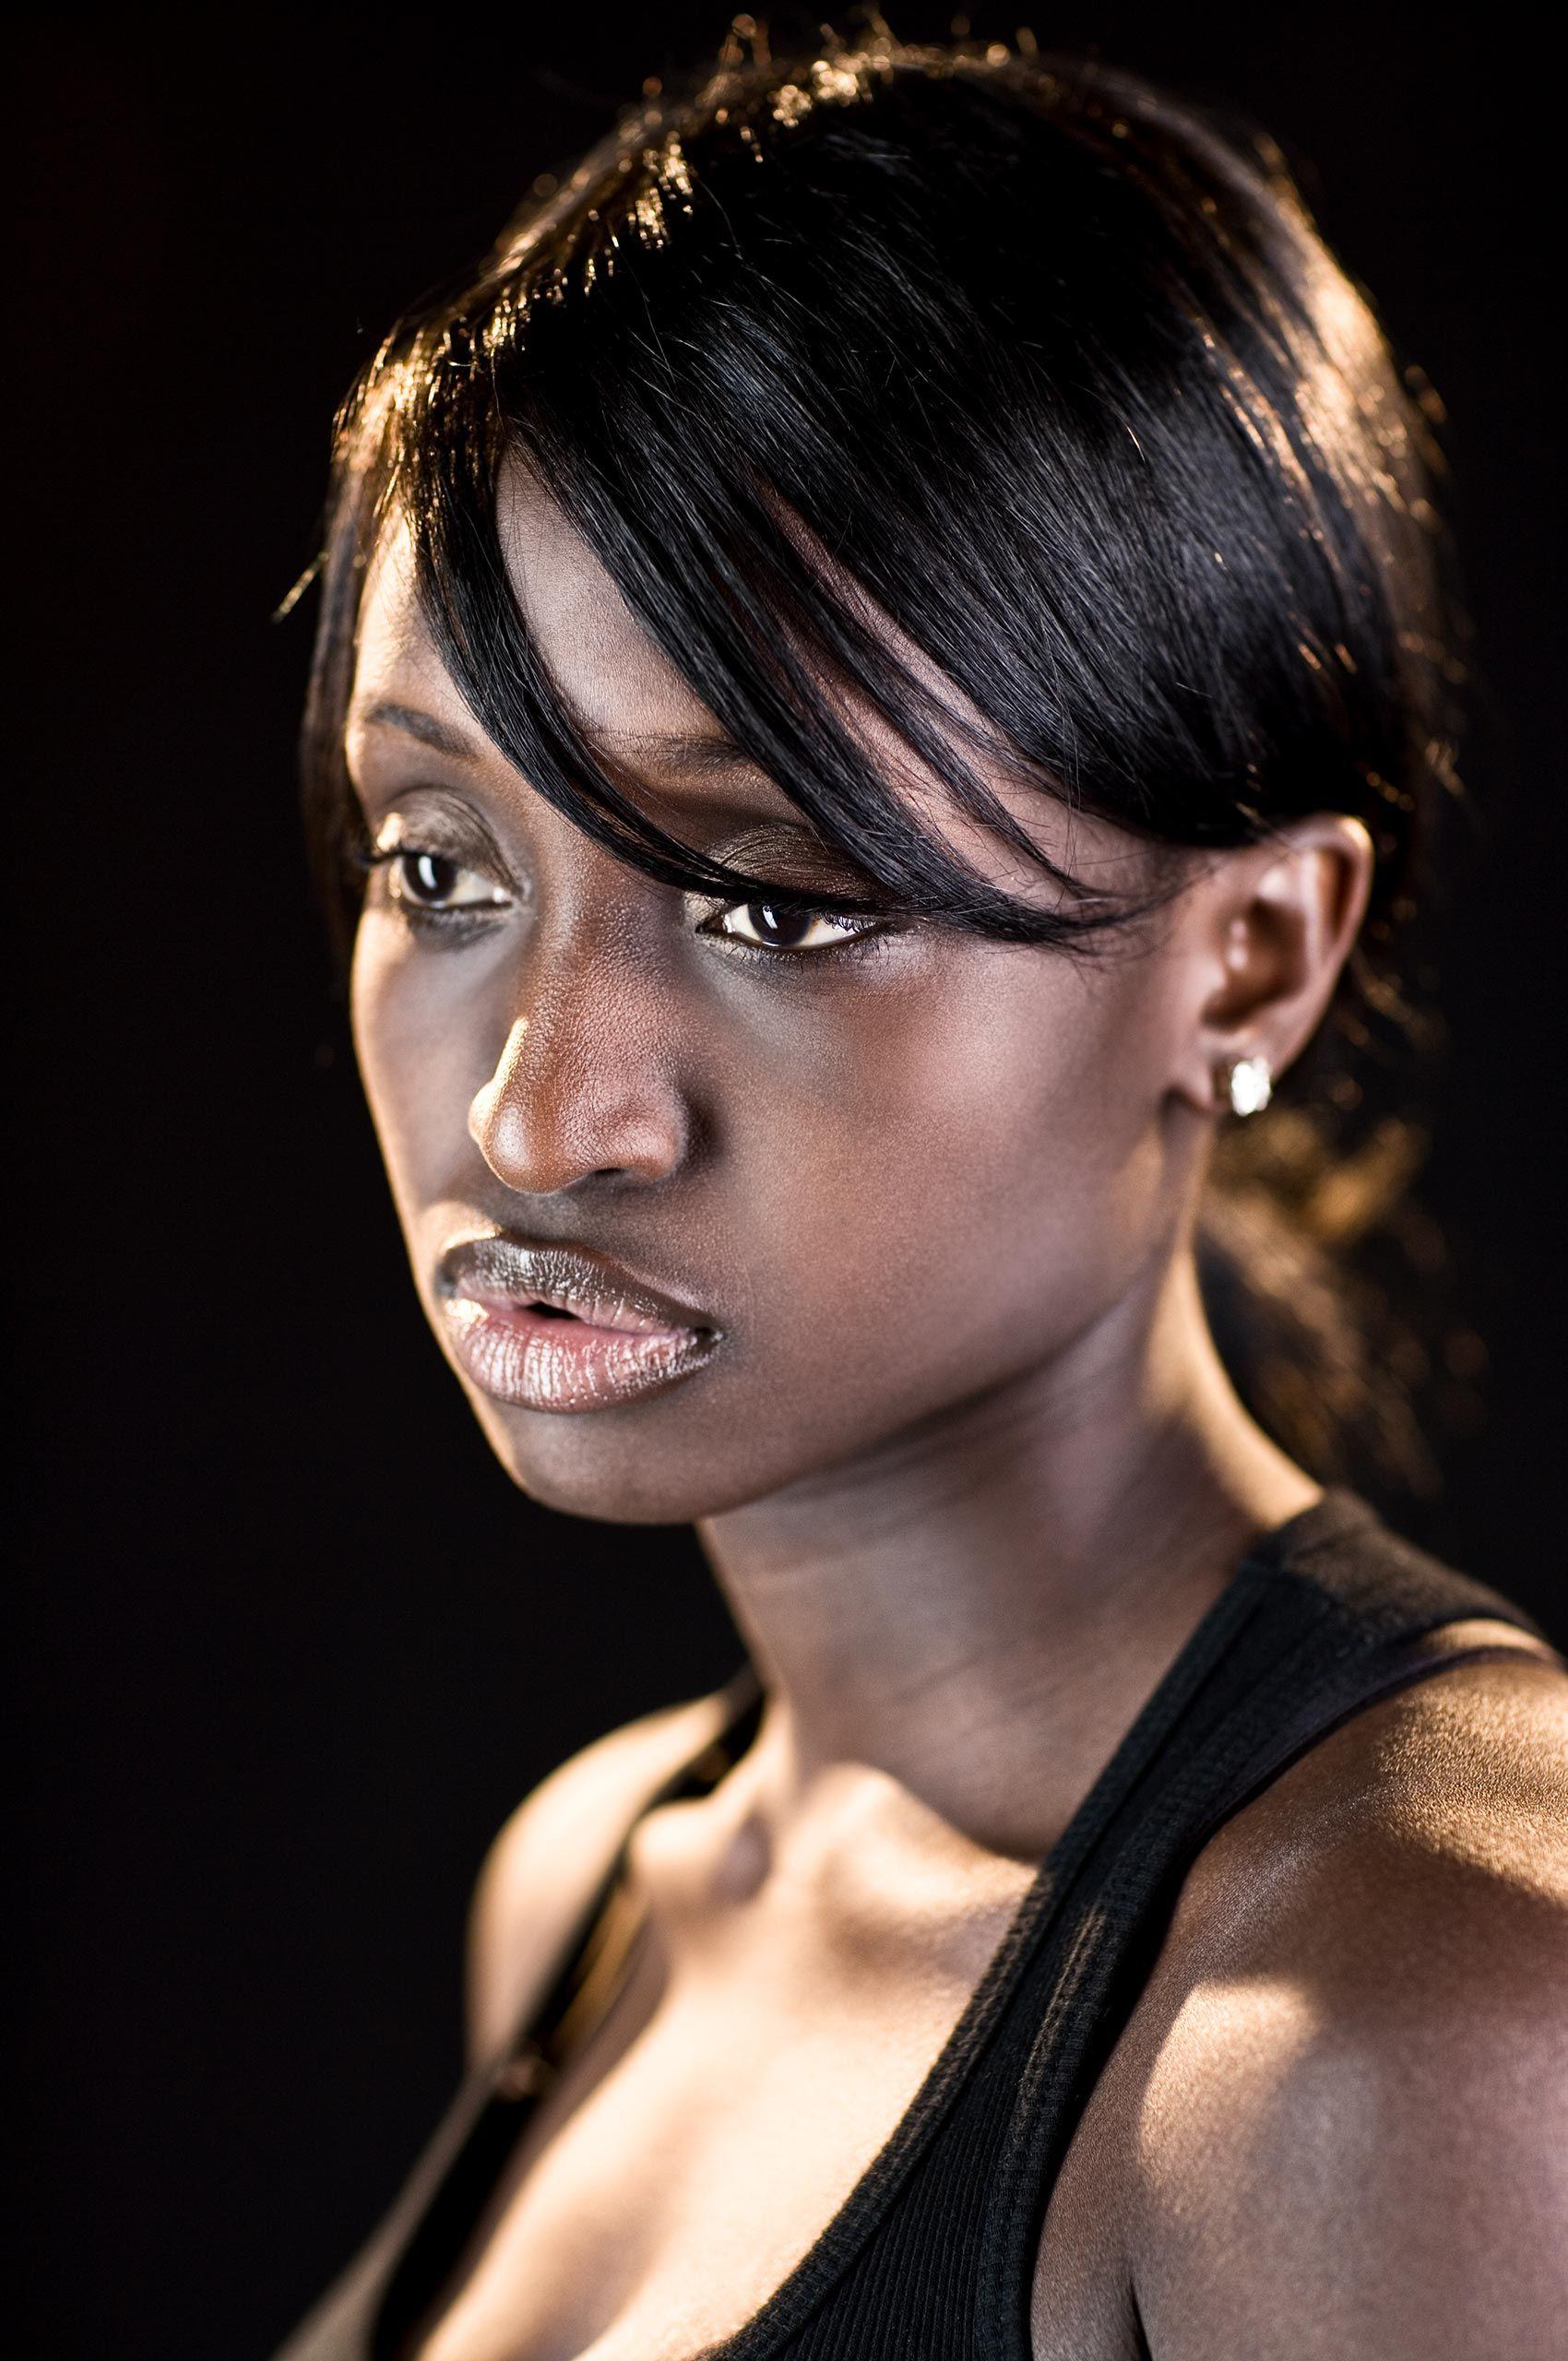 portrait-young-gorgeous-africanamerican-woman-HenrikOlundPhotography.jpg